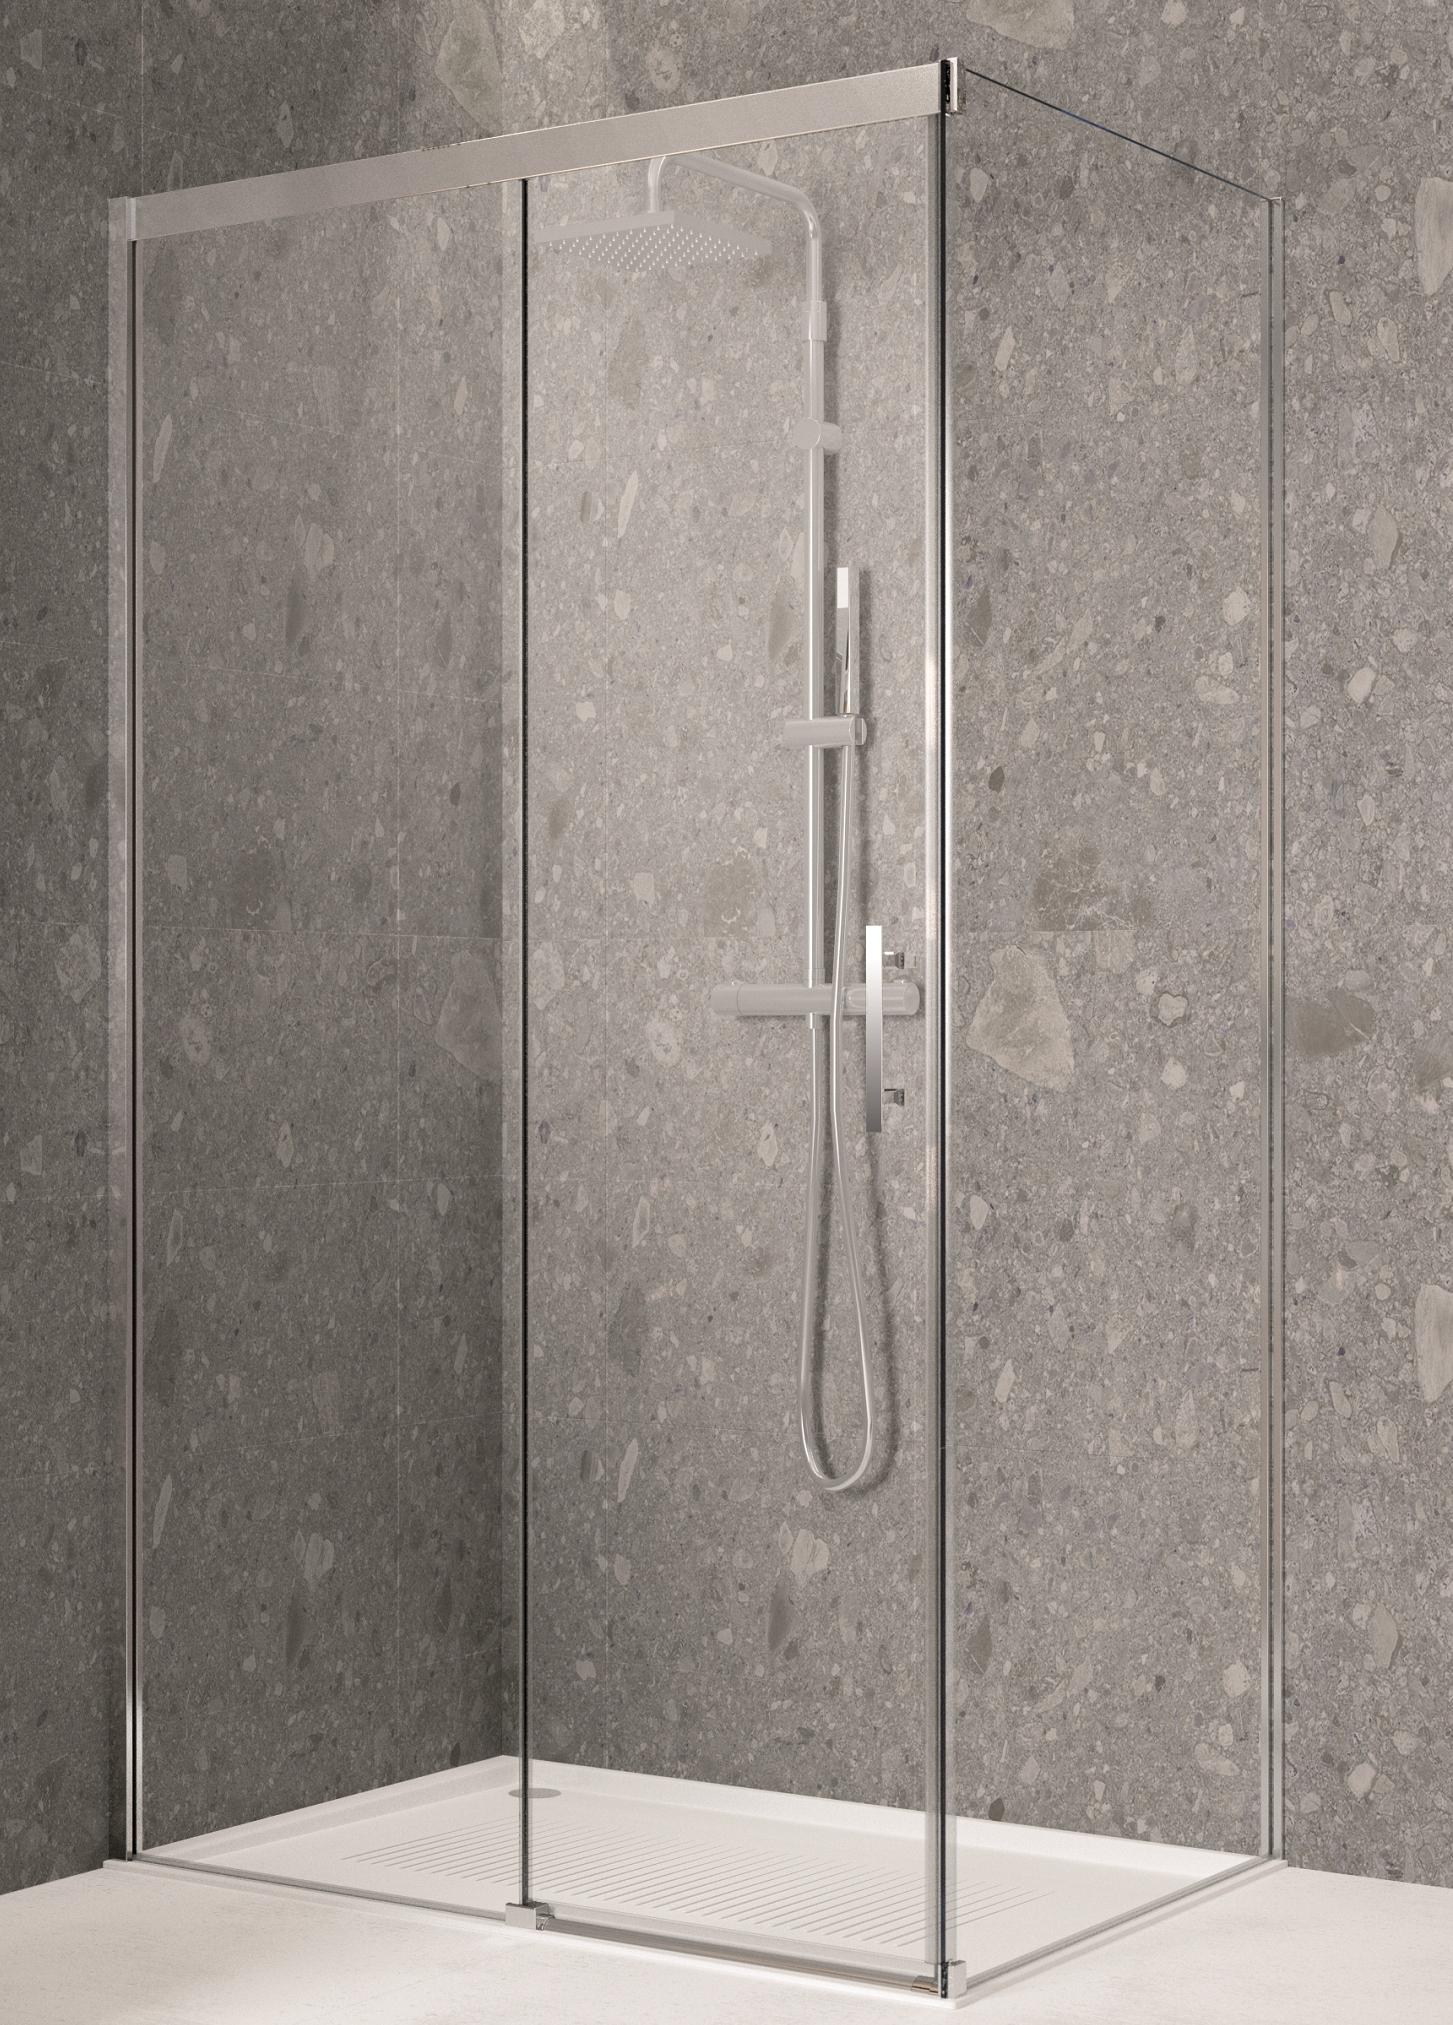 NOVELLINI sprcha KALI PH+FH 160x80 +++